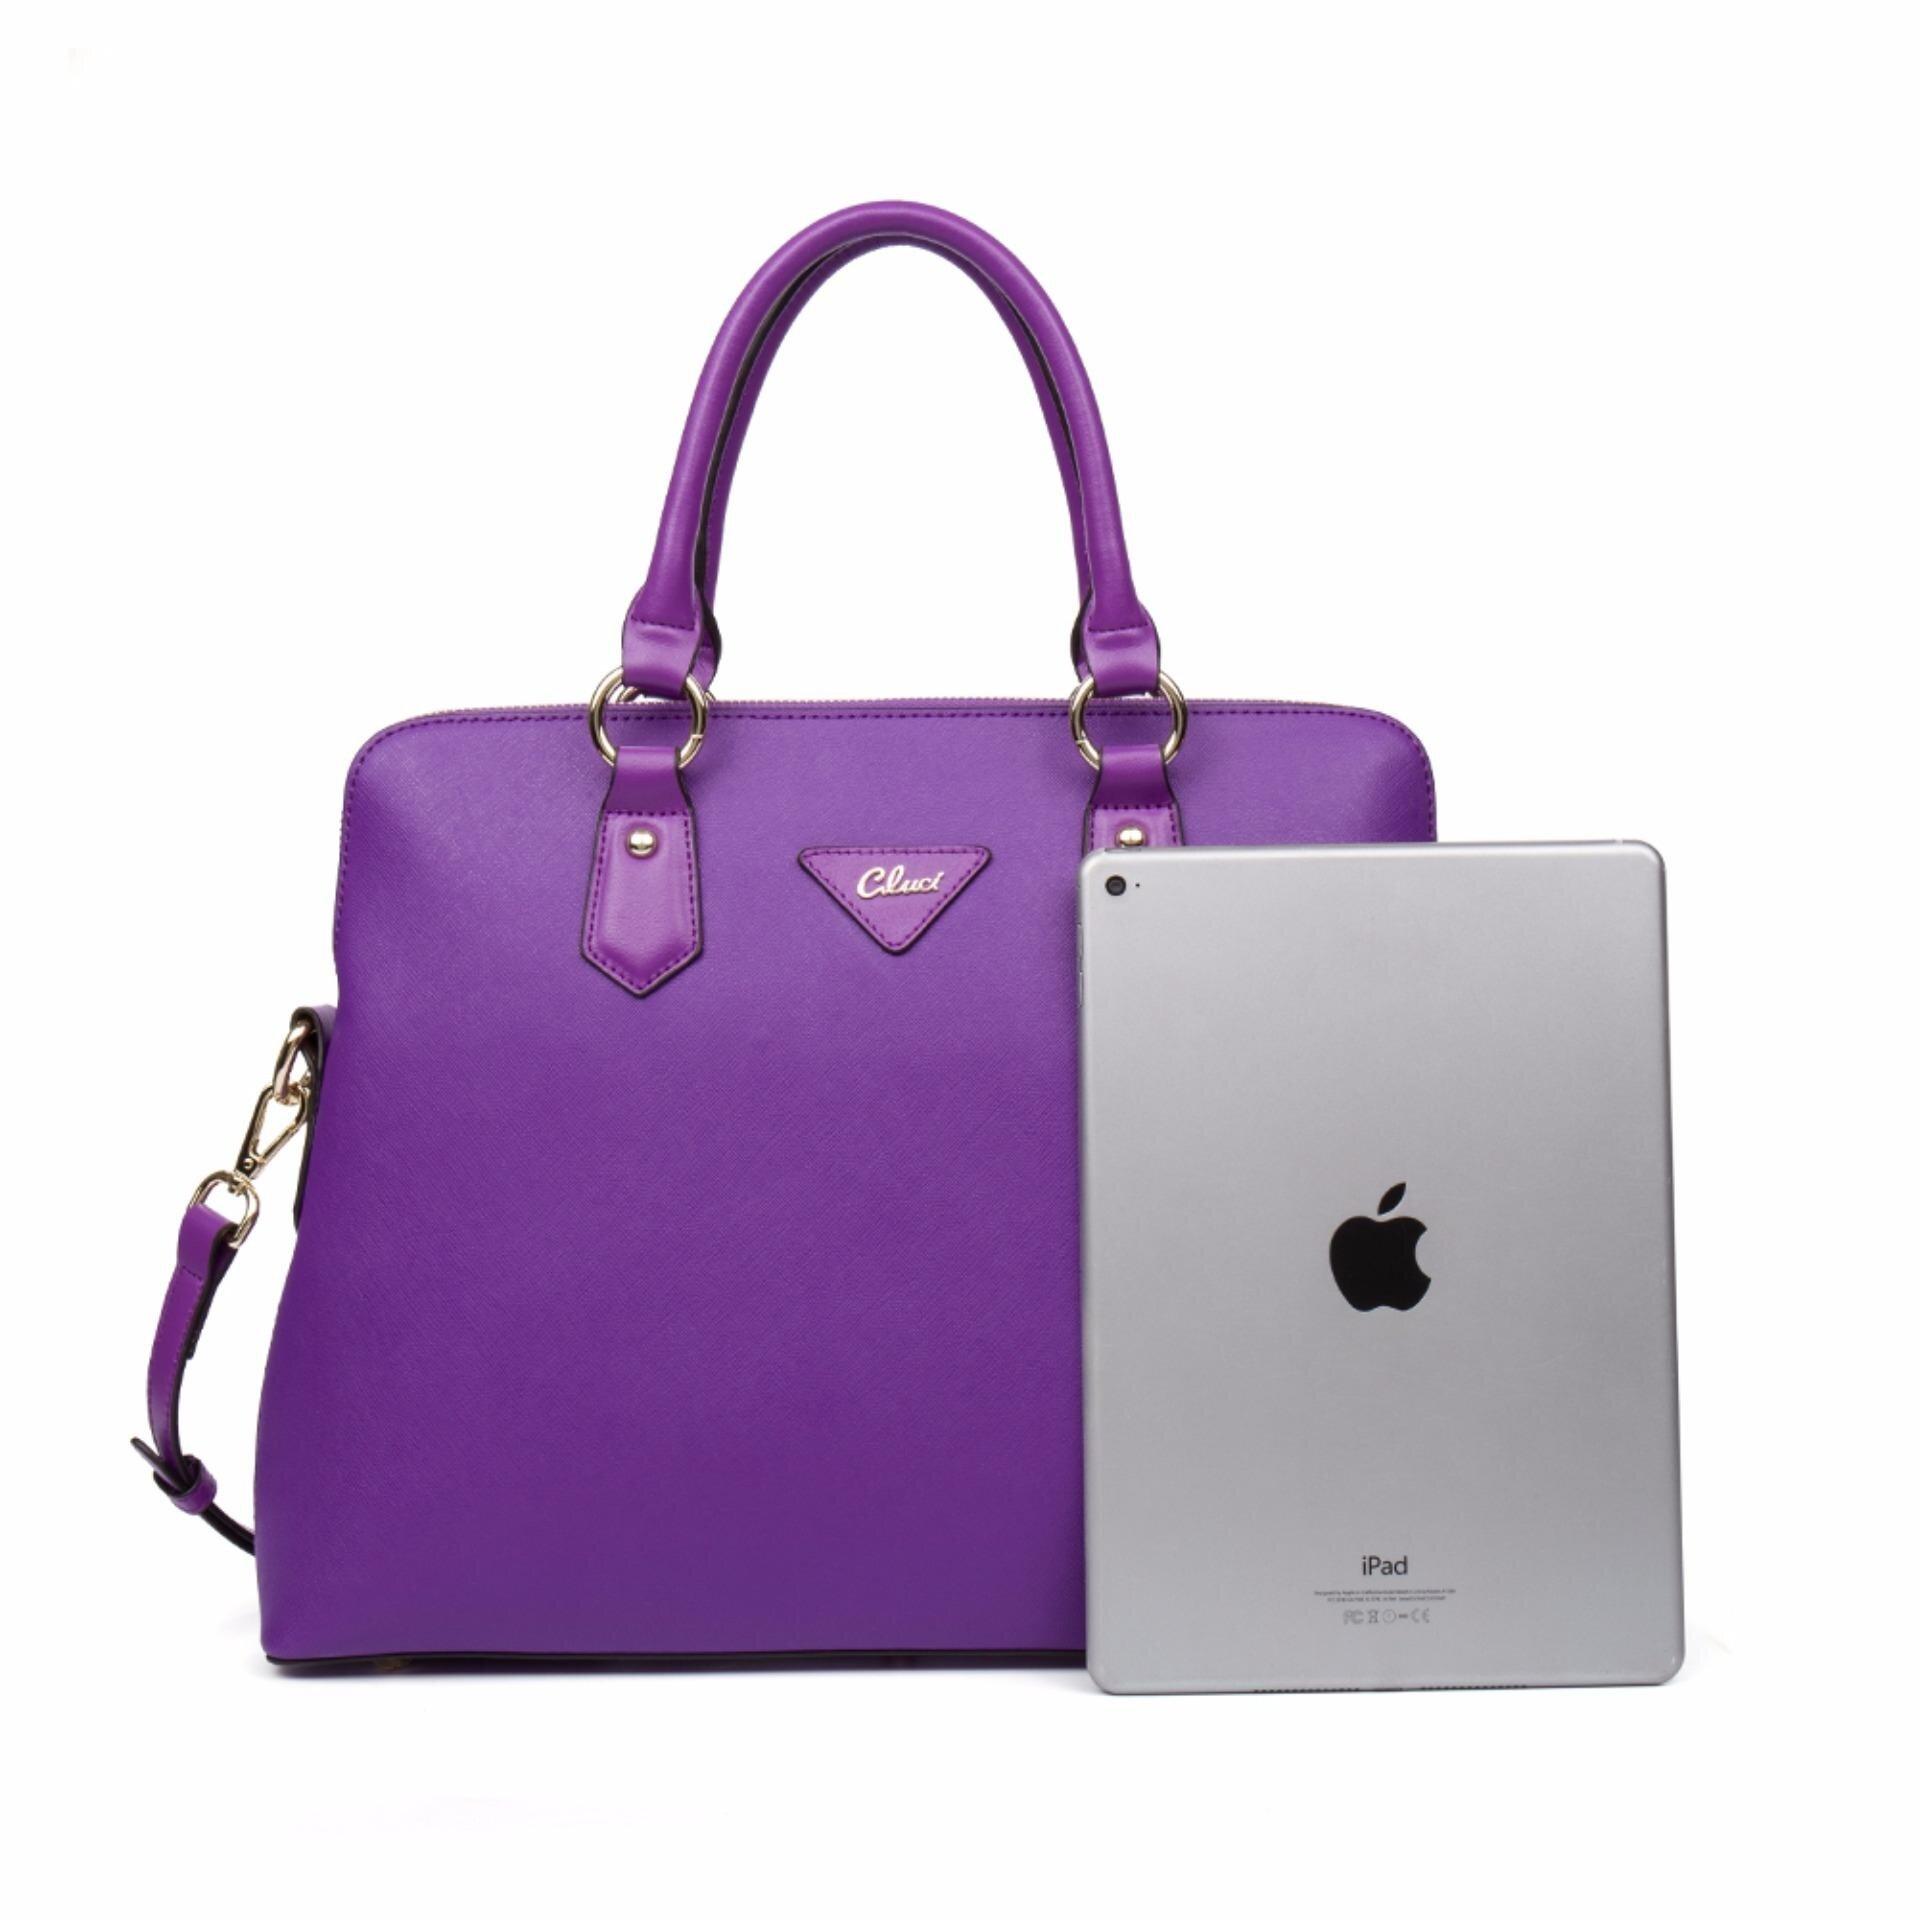 CLUCI Source · CLUCI Women s Genuine Cowhide Leather Handbag Casual Shoulder BagPurple intl